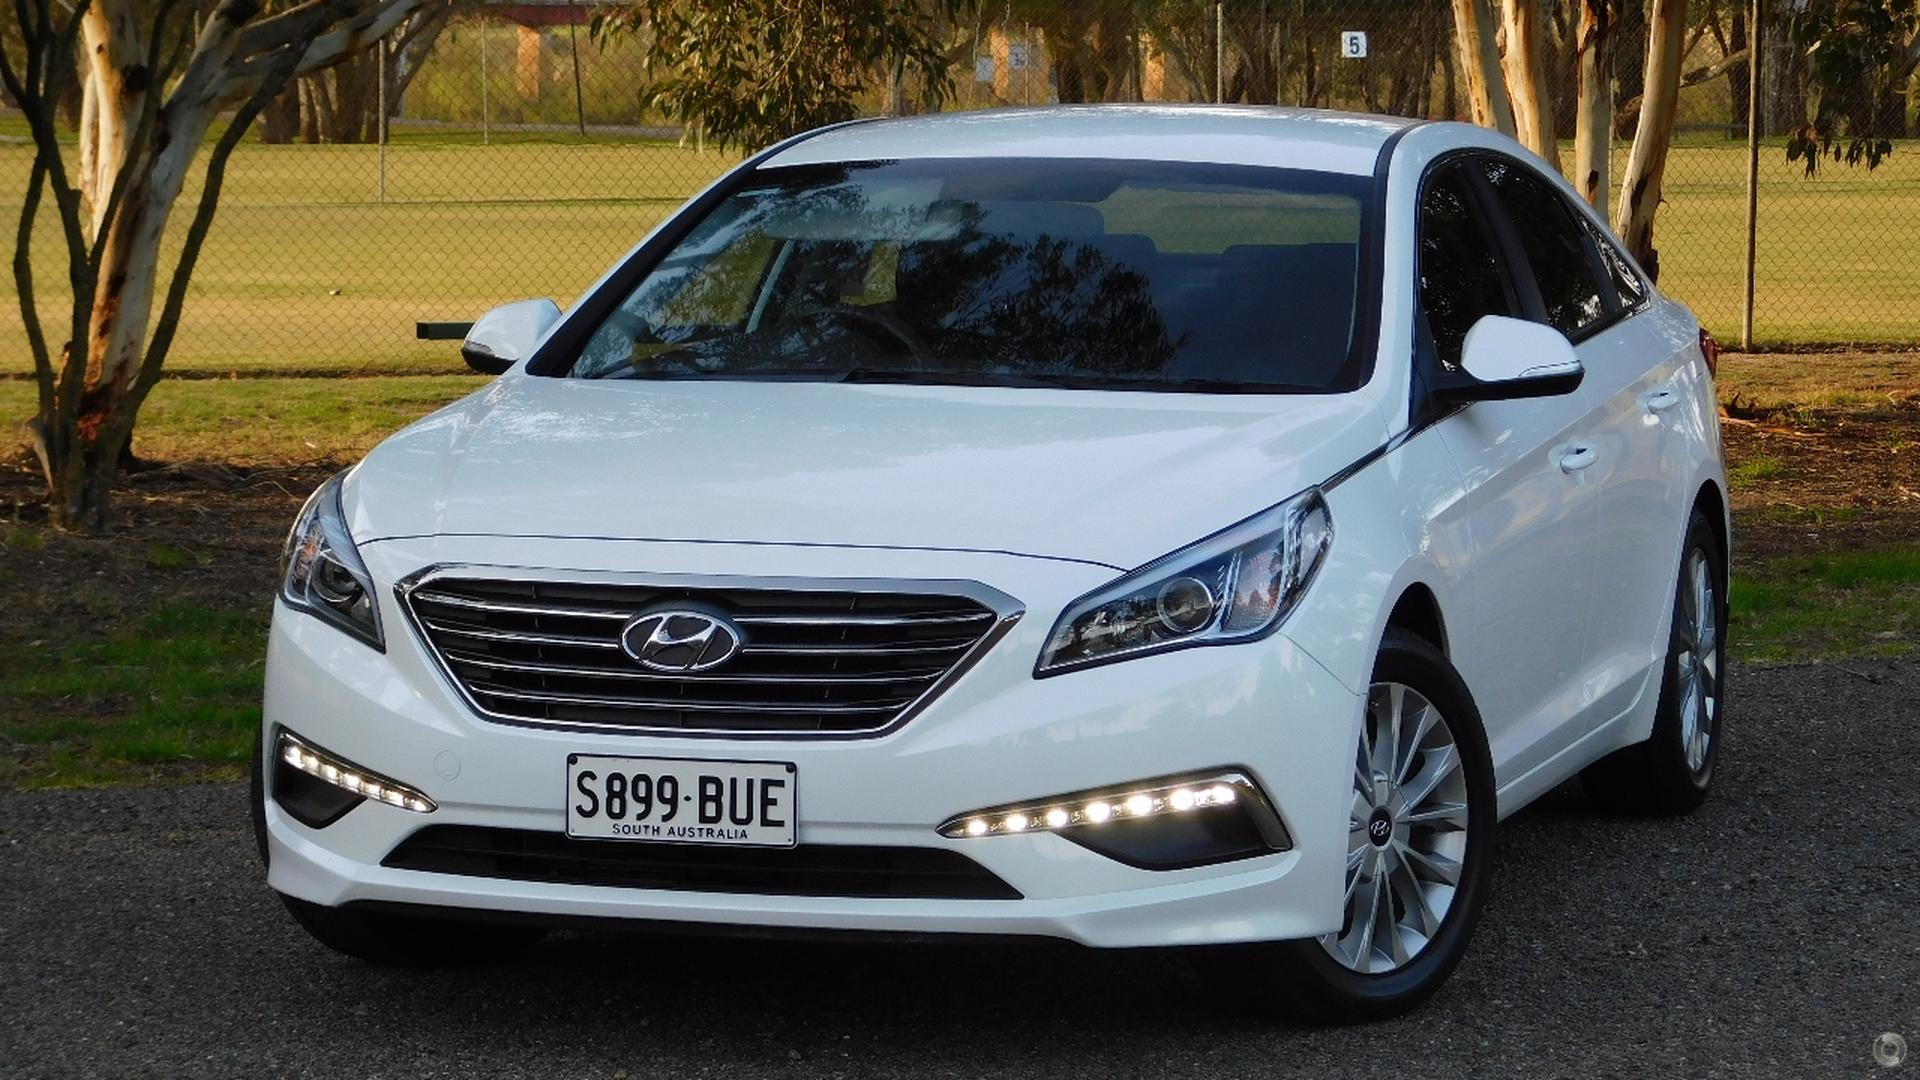 2014 Hyundai Sonata Active